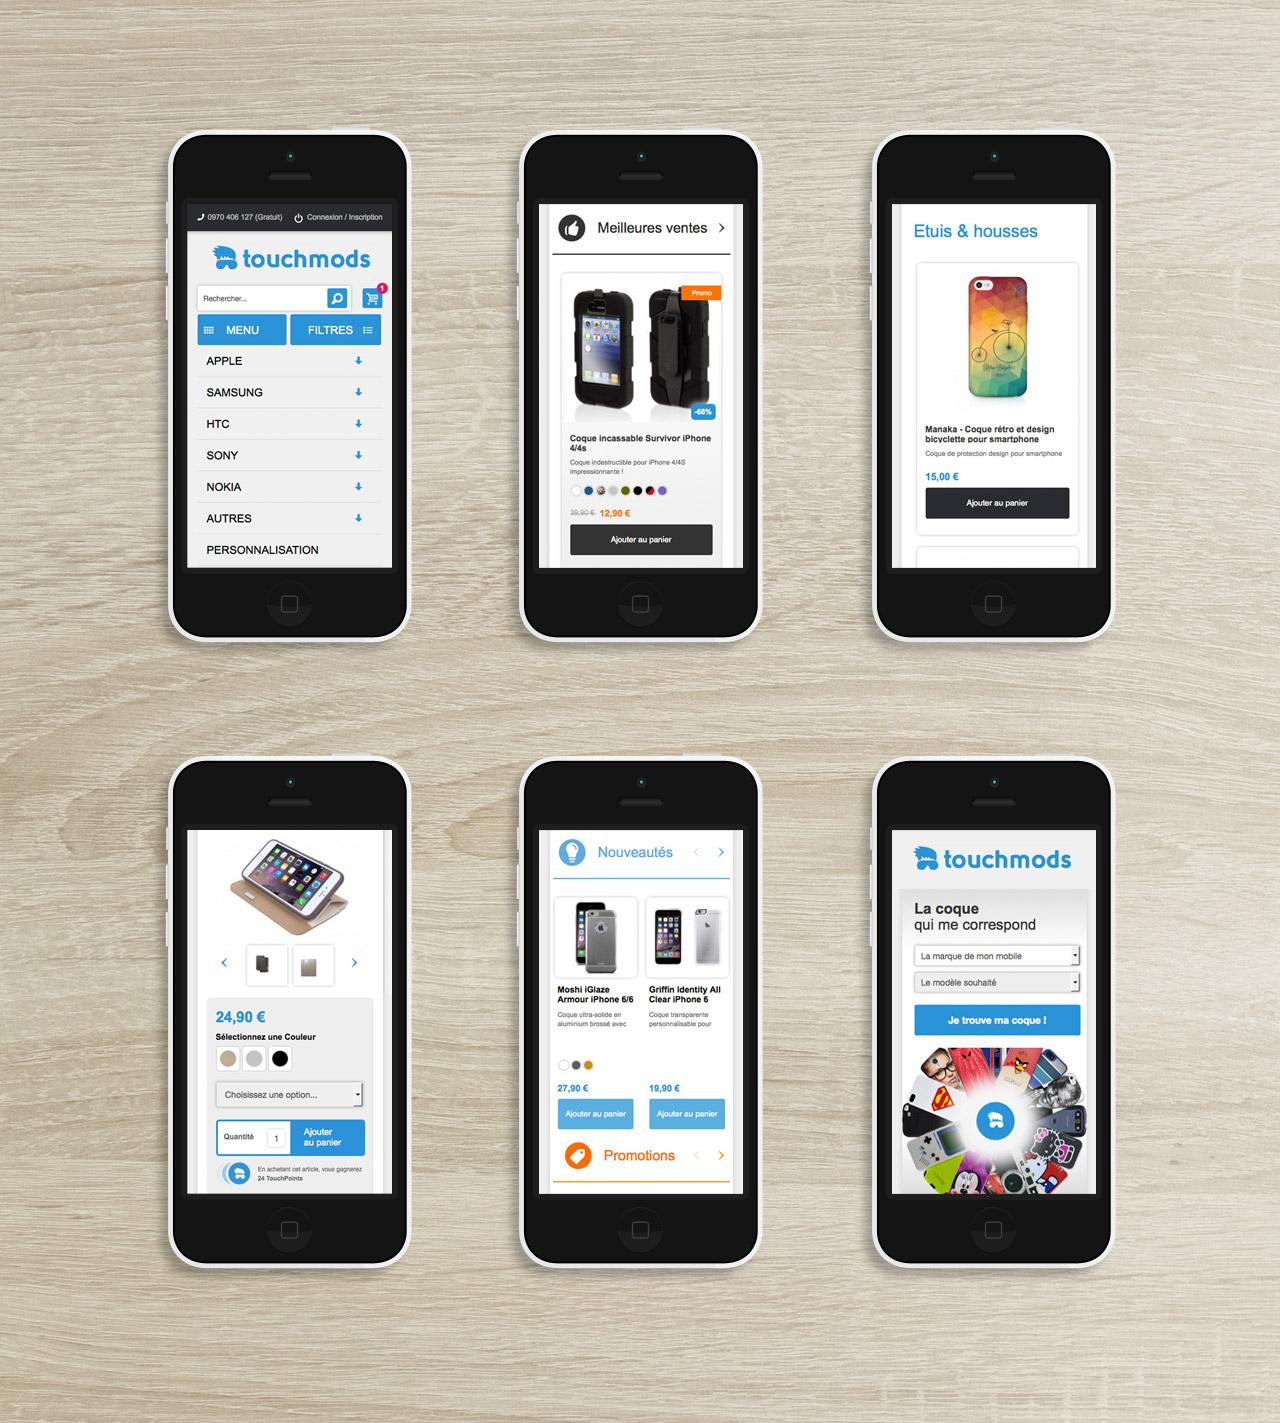 touchmods-site-mobile-responsive-design-creation-communication-caconcept-alexis-cretin-graphiste